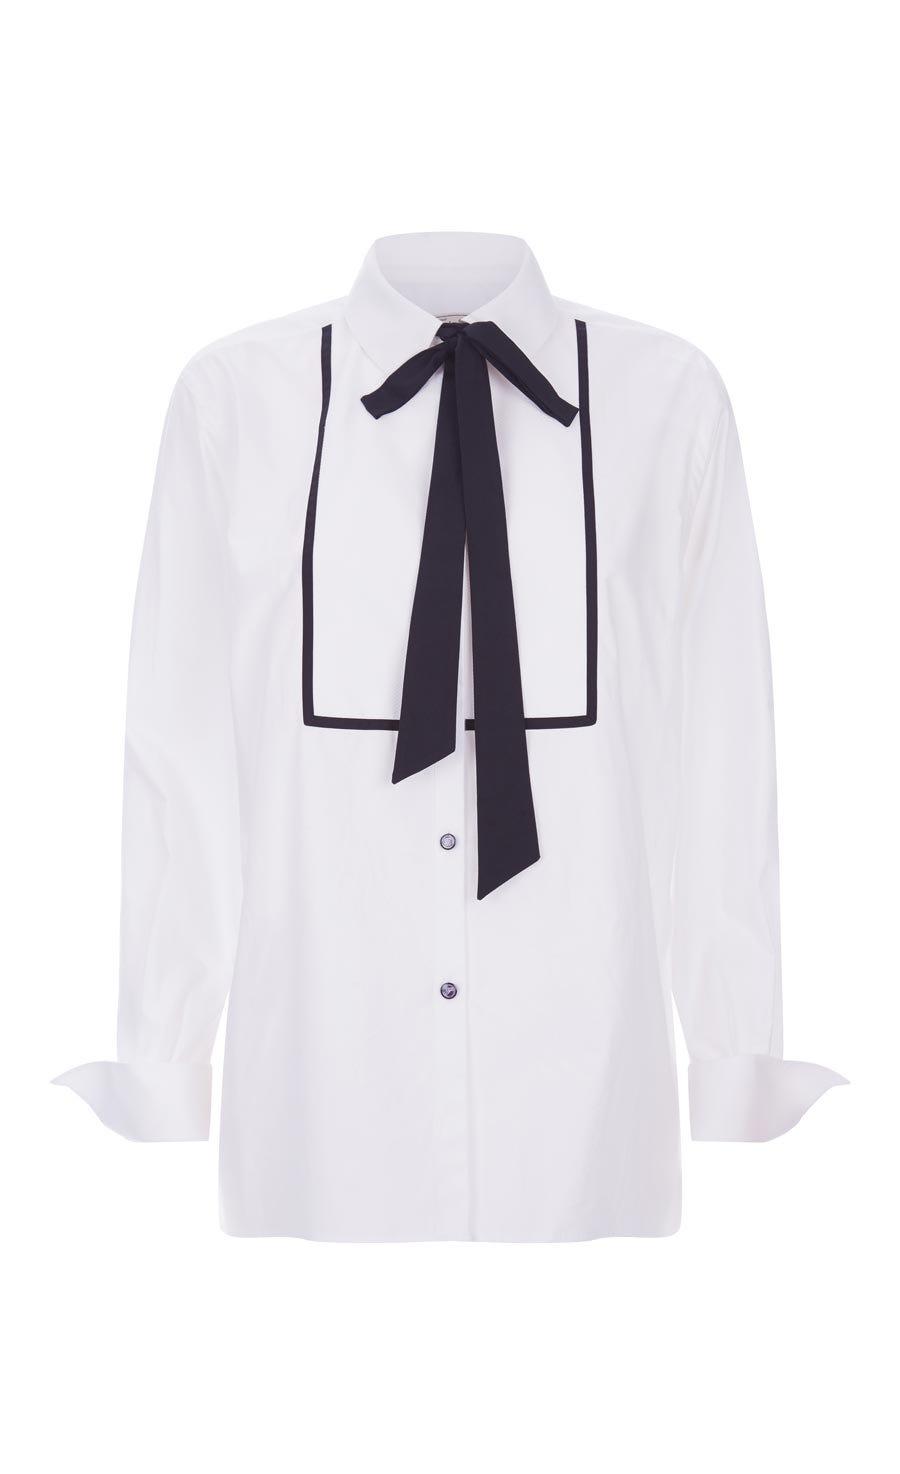 Enigma Shirt, White